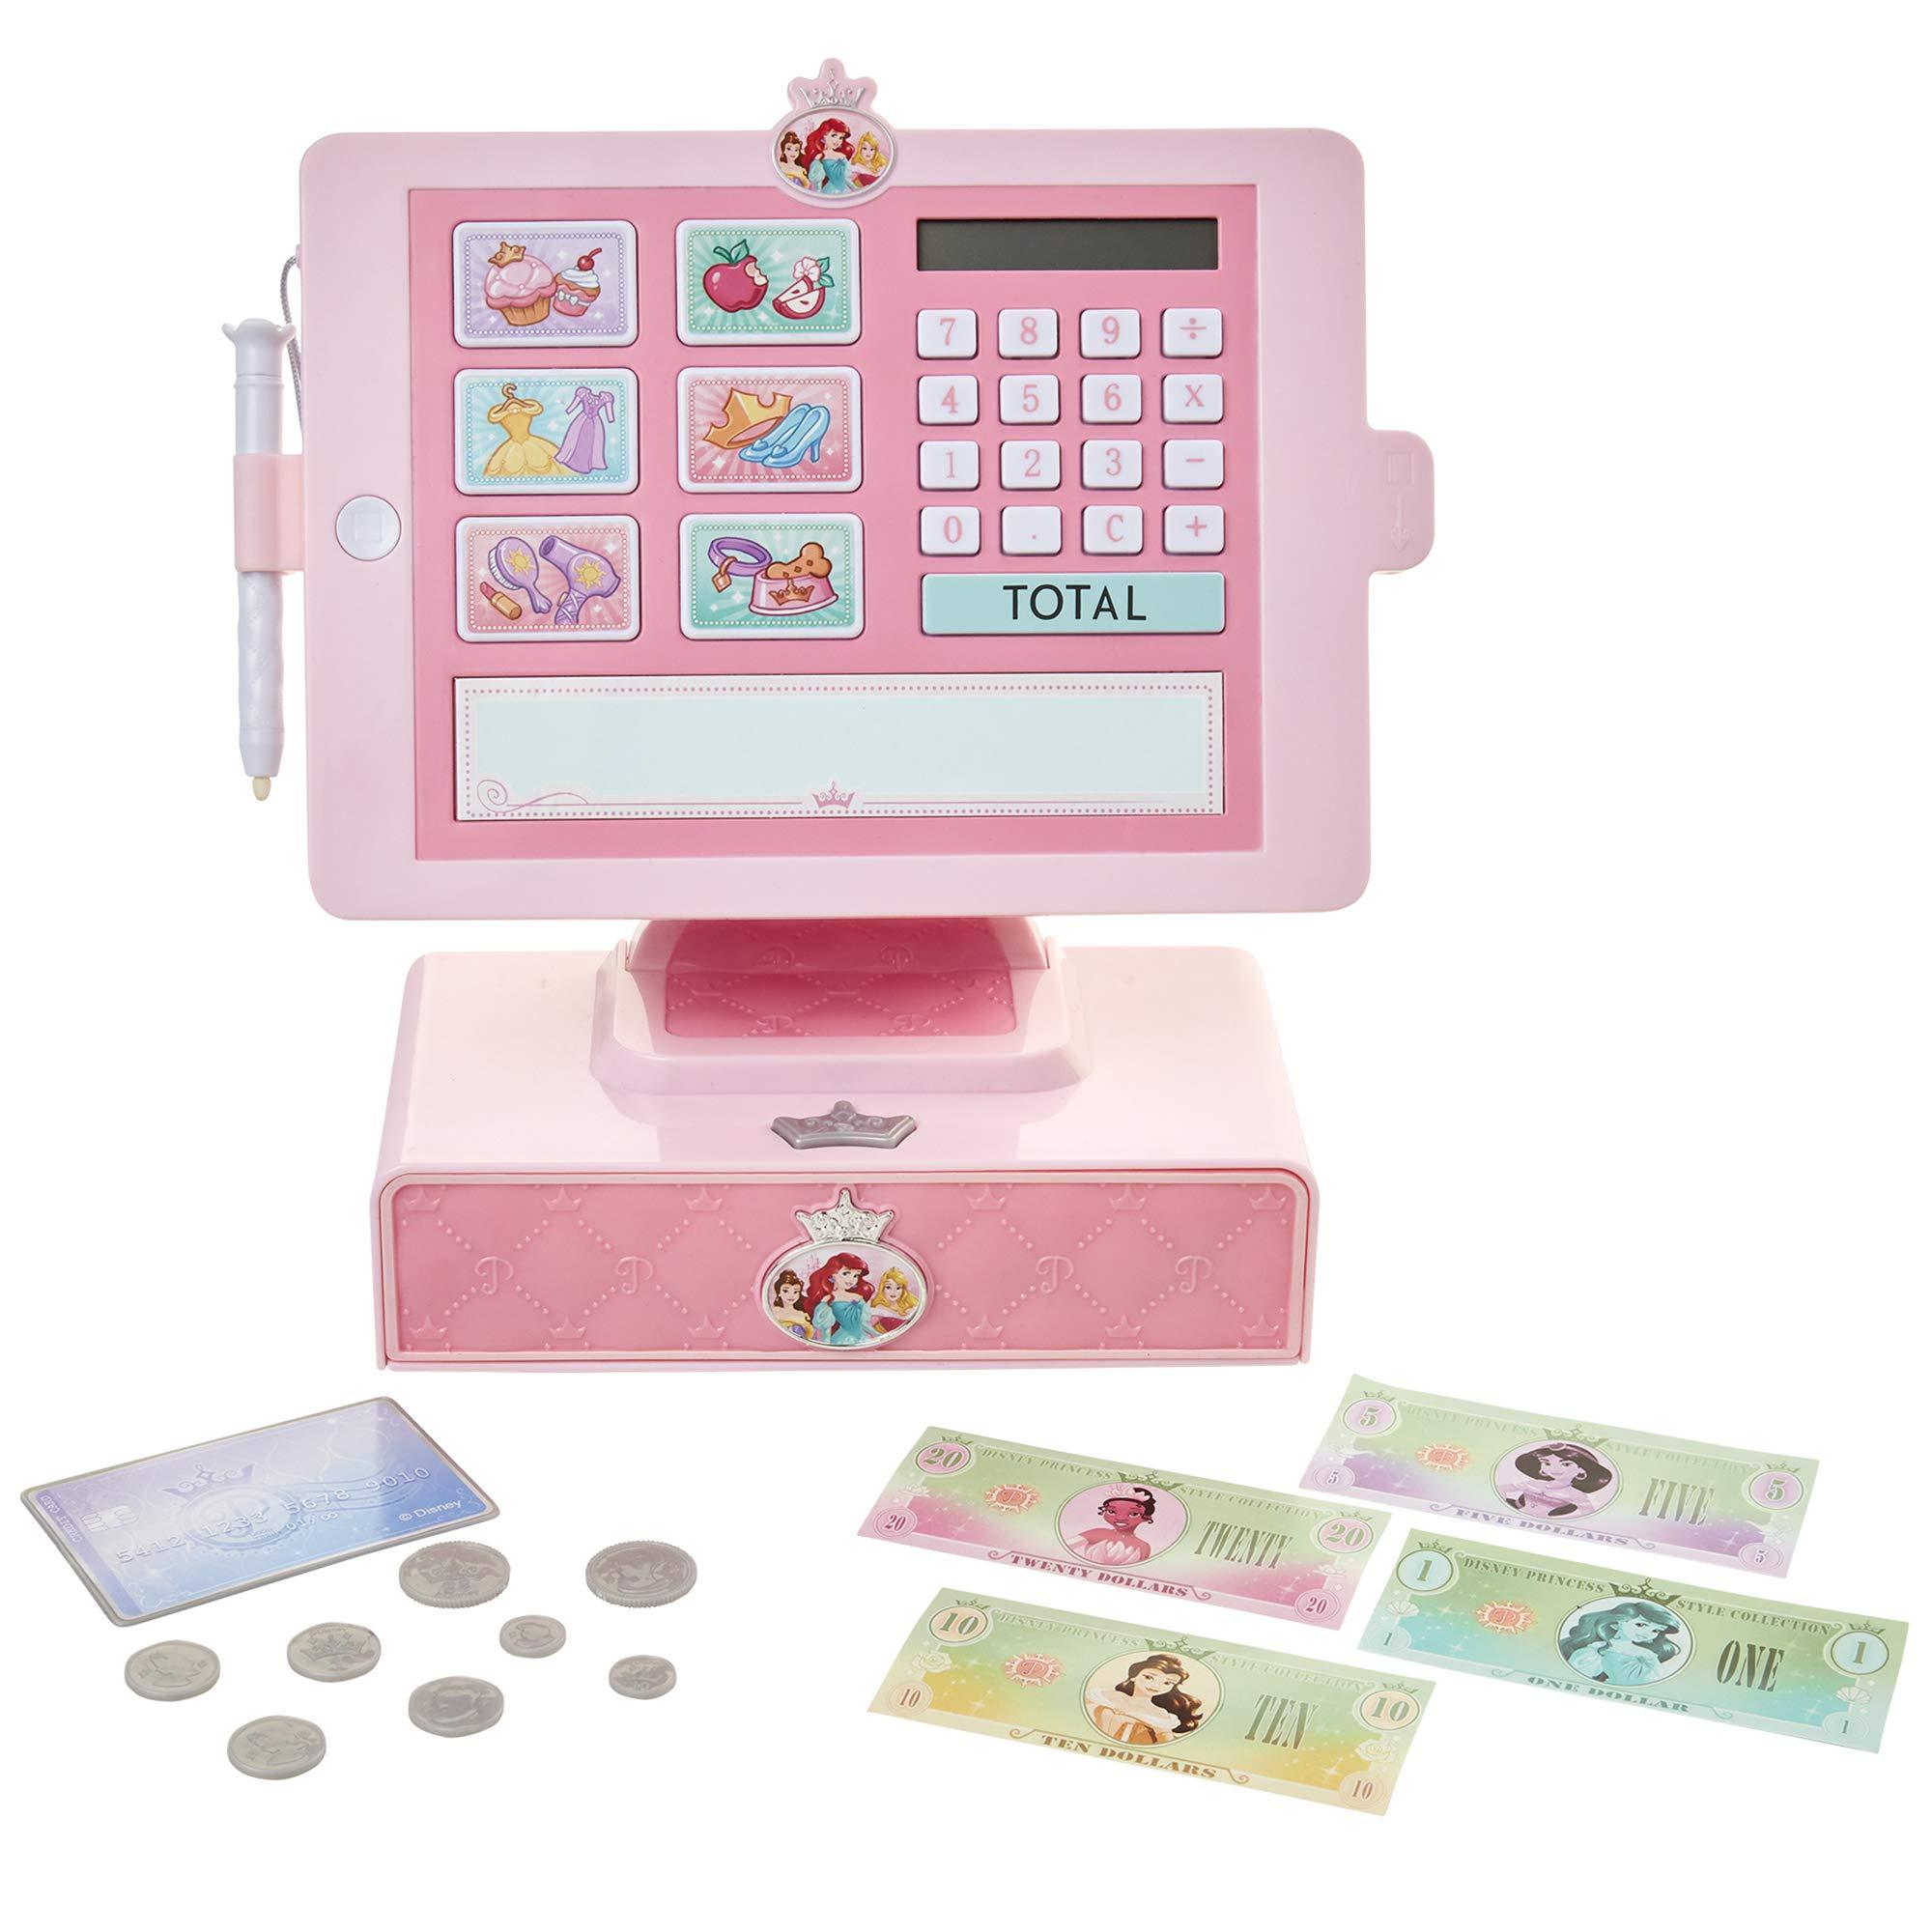 Disney Princess Style Collection- Sleek Cash Register